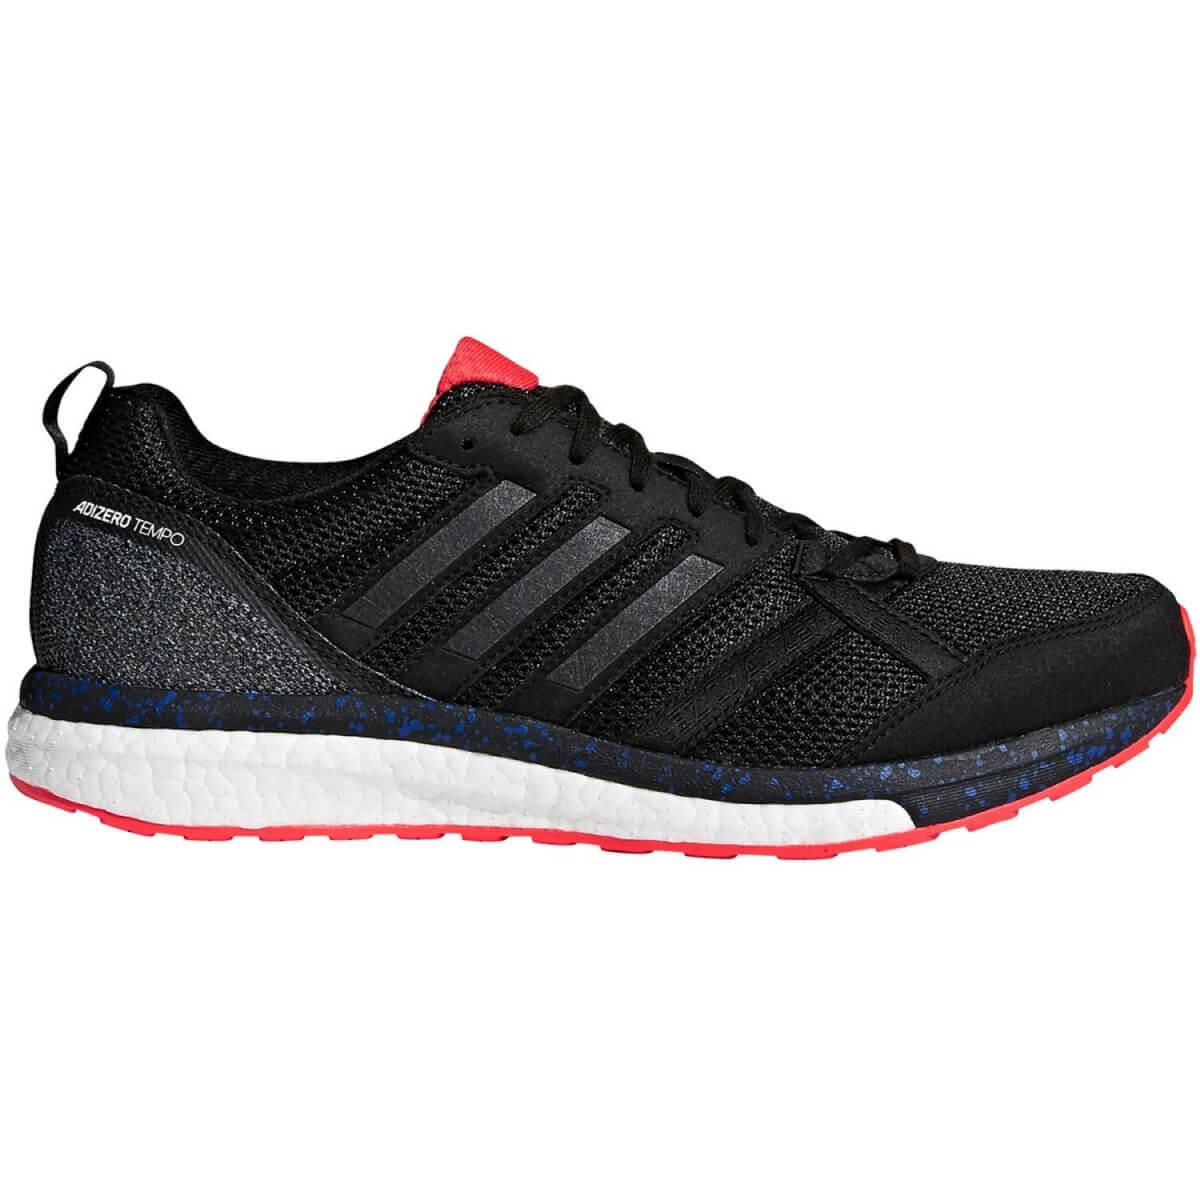 Zapatillas Adidas Adizero Tempo 9 aktiv